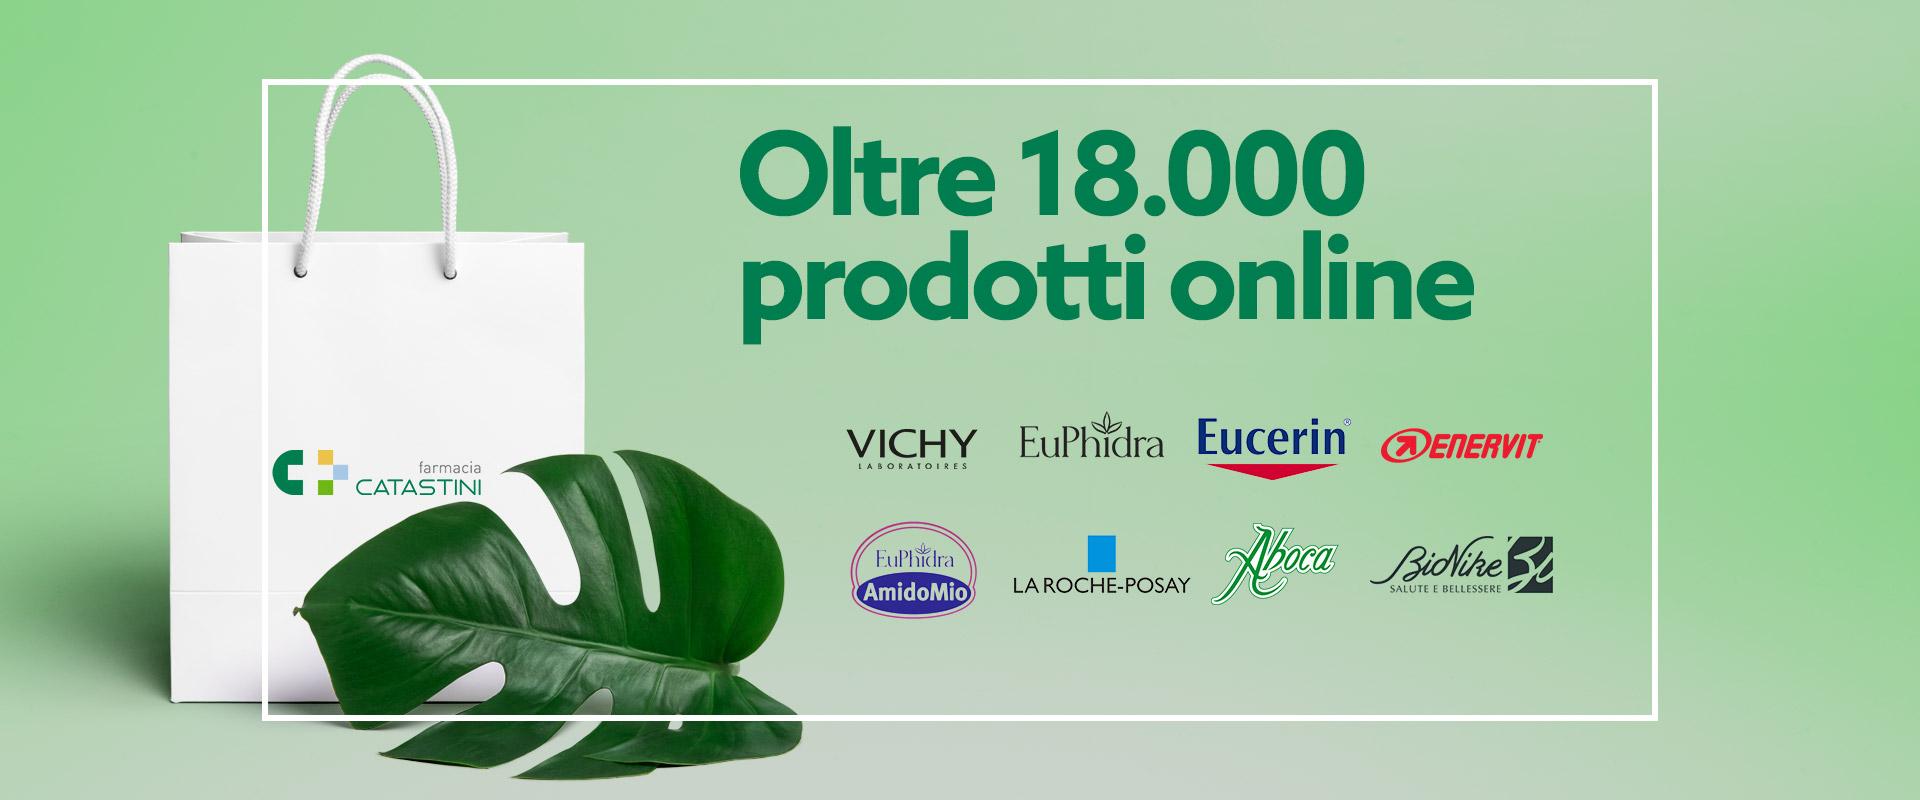 E-commerce Farmacia Catastini